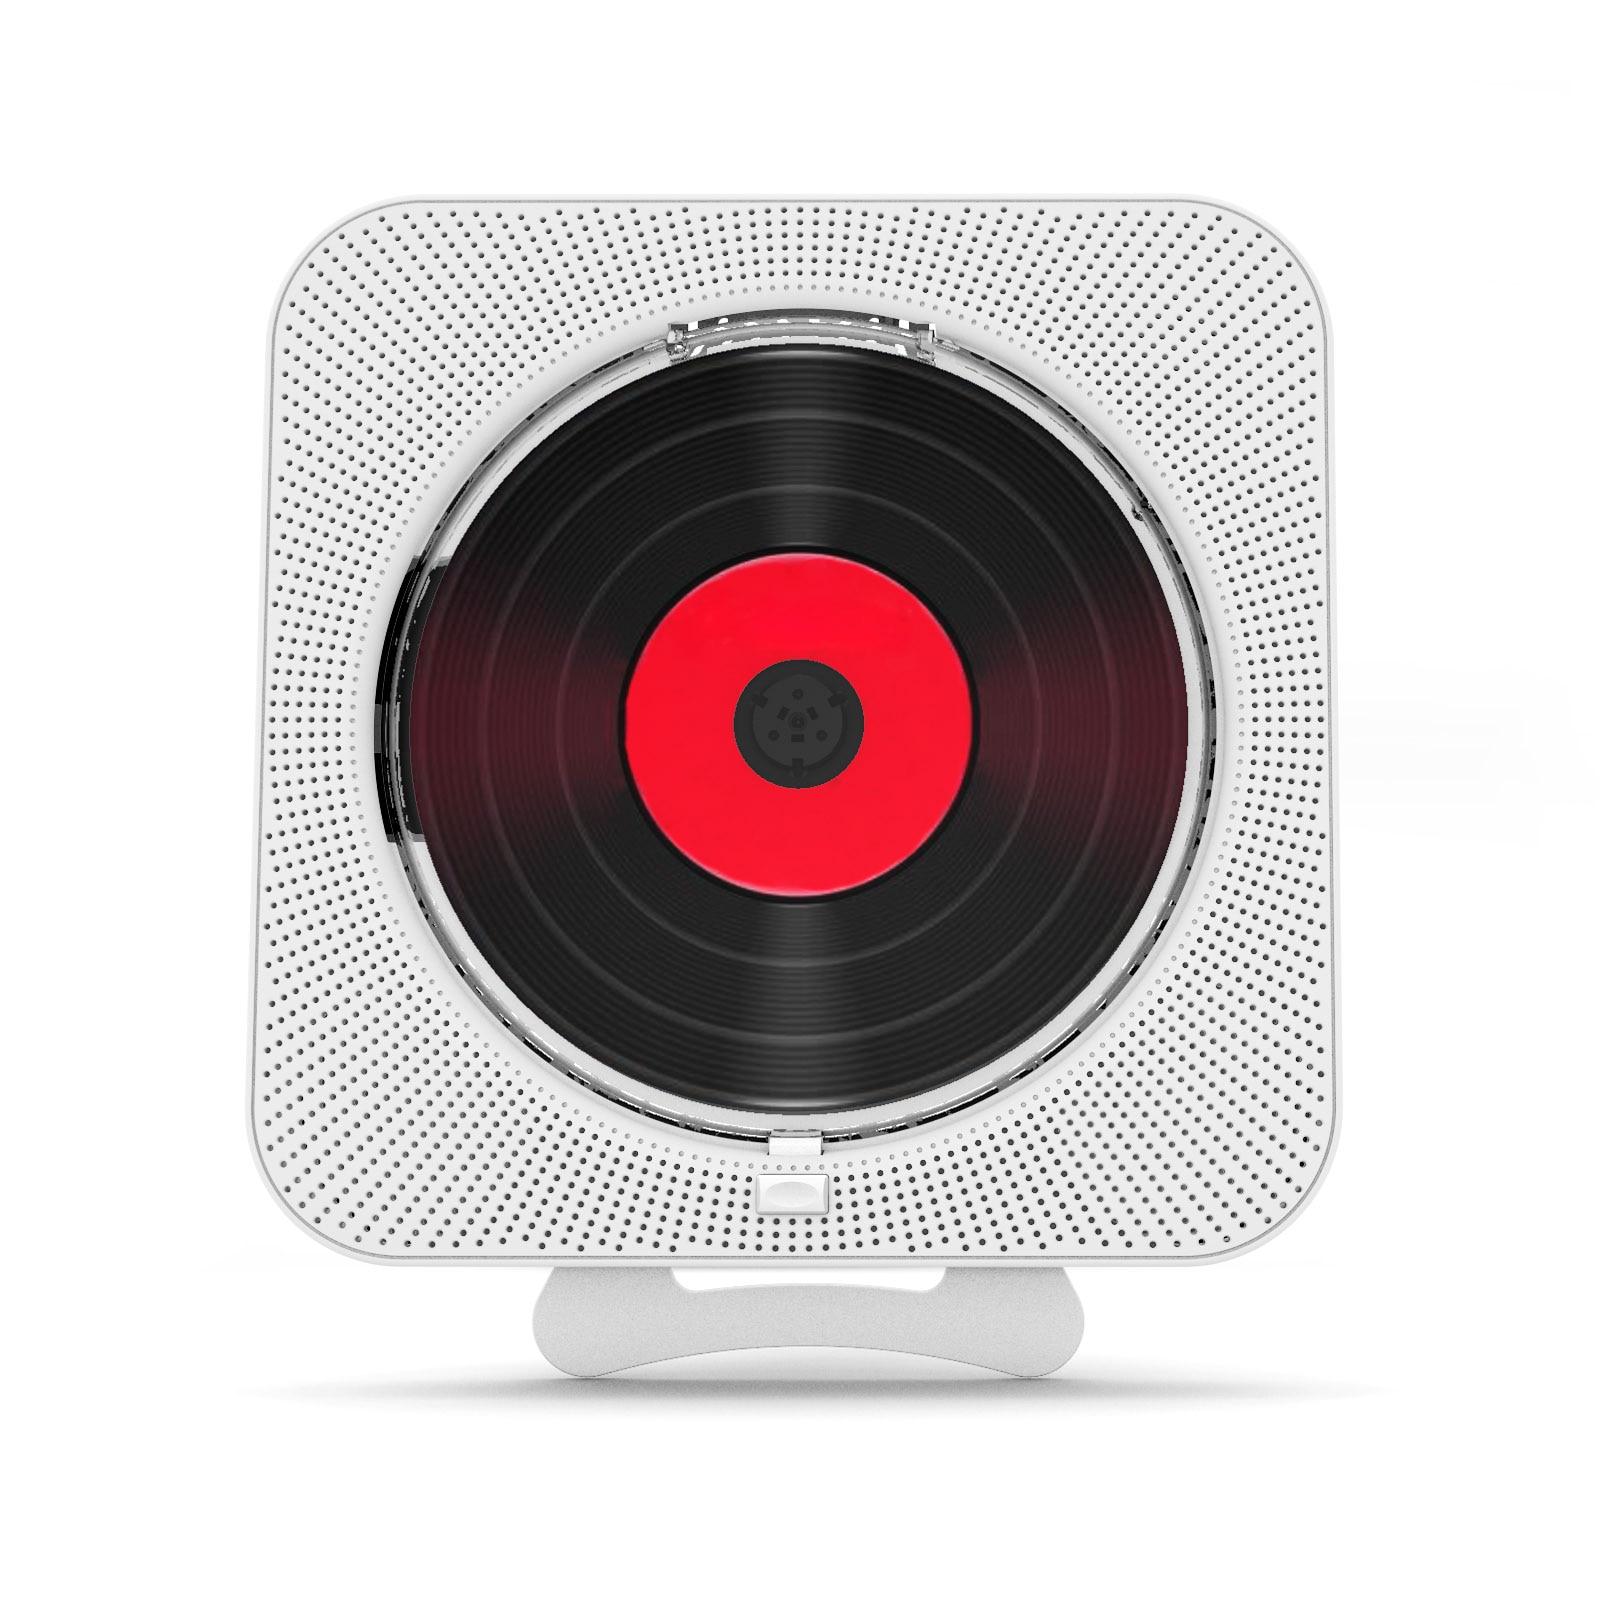 Portable CD Player With Bluetooth Remote Control Walkman Stereo FM Radio HiFi Music Built-in Speaker Discman Lecteur CD enlarge